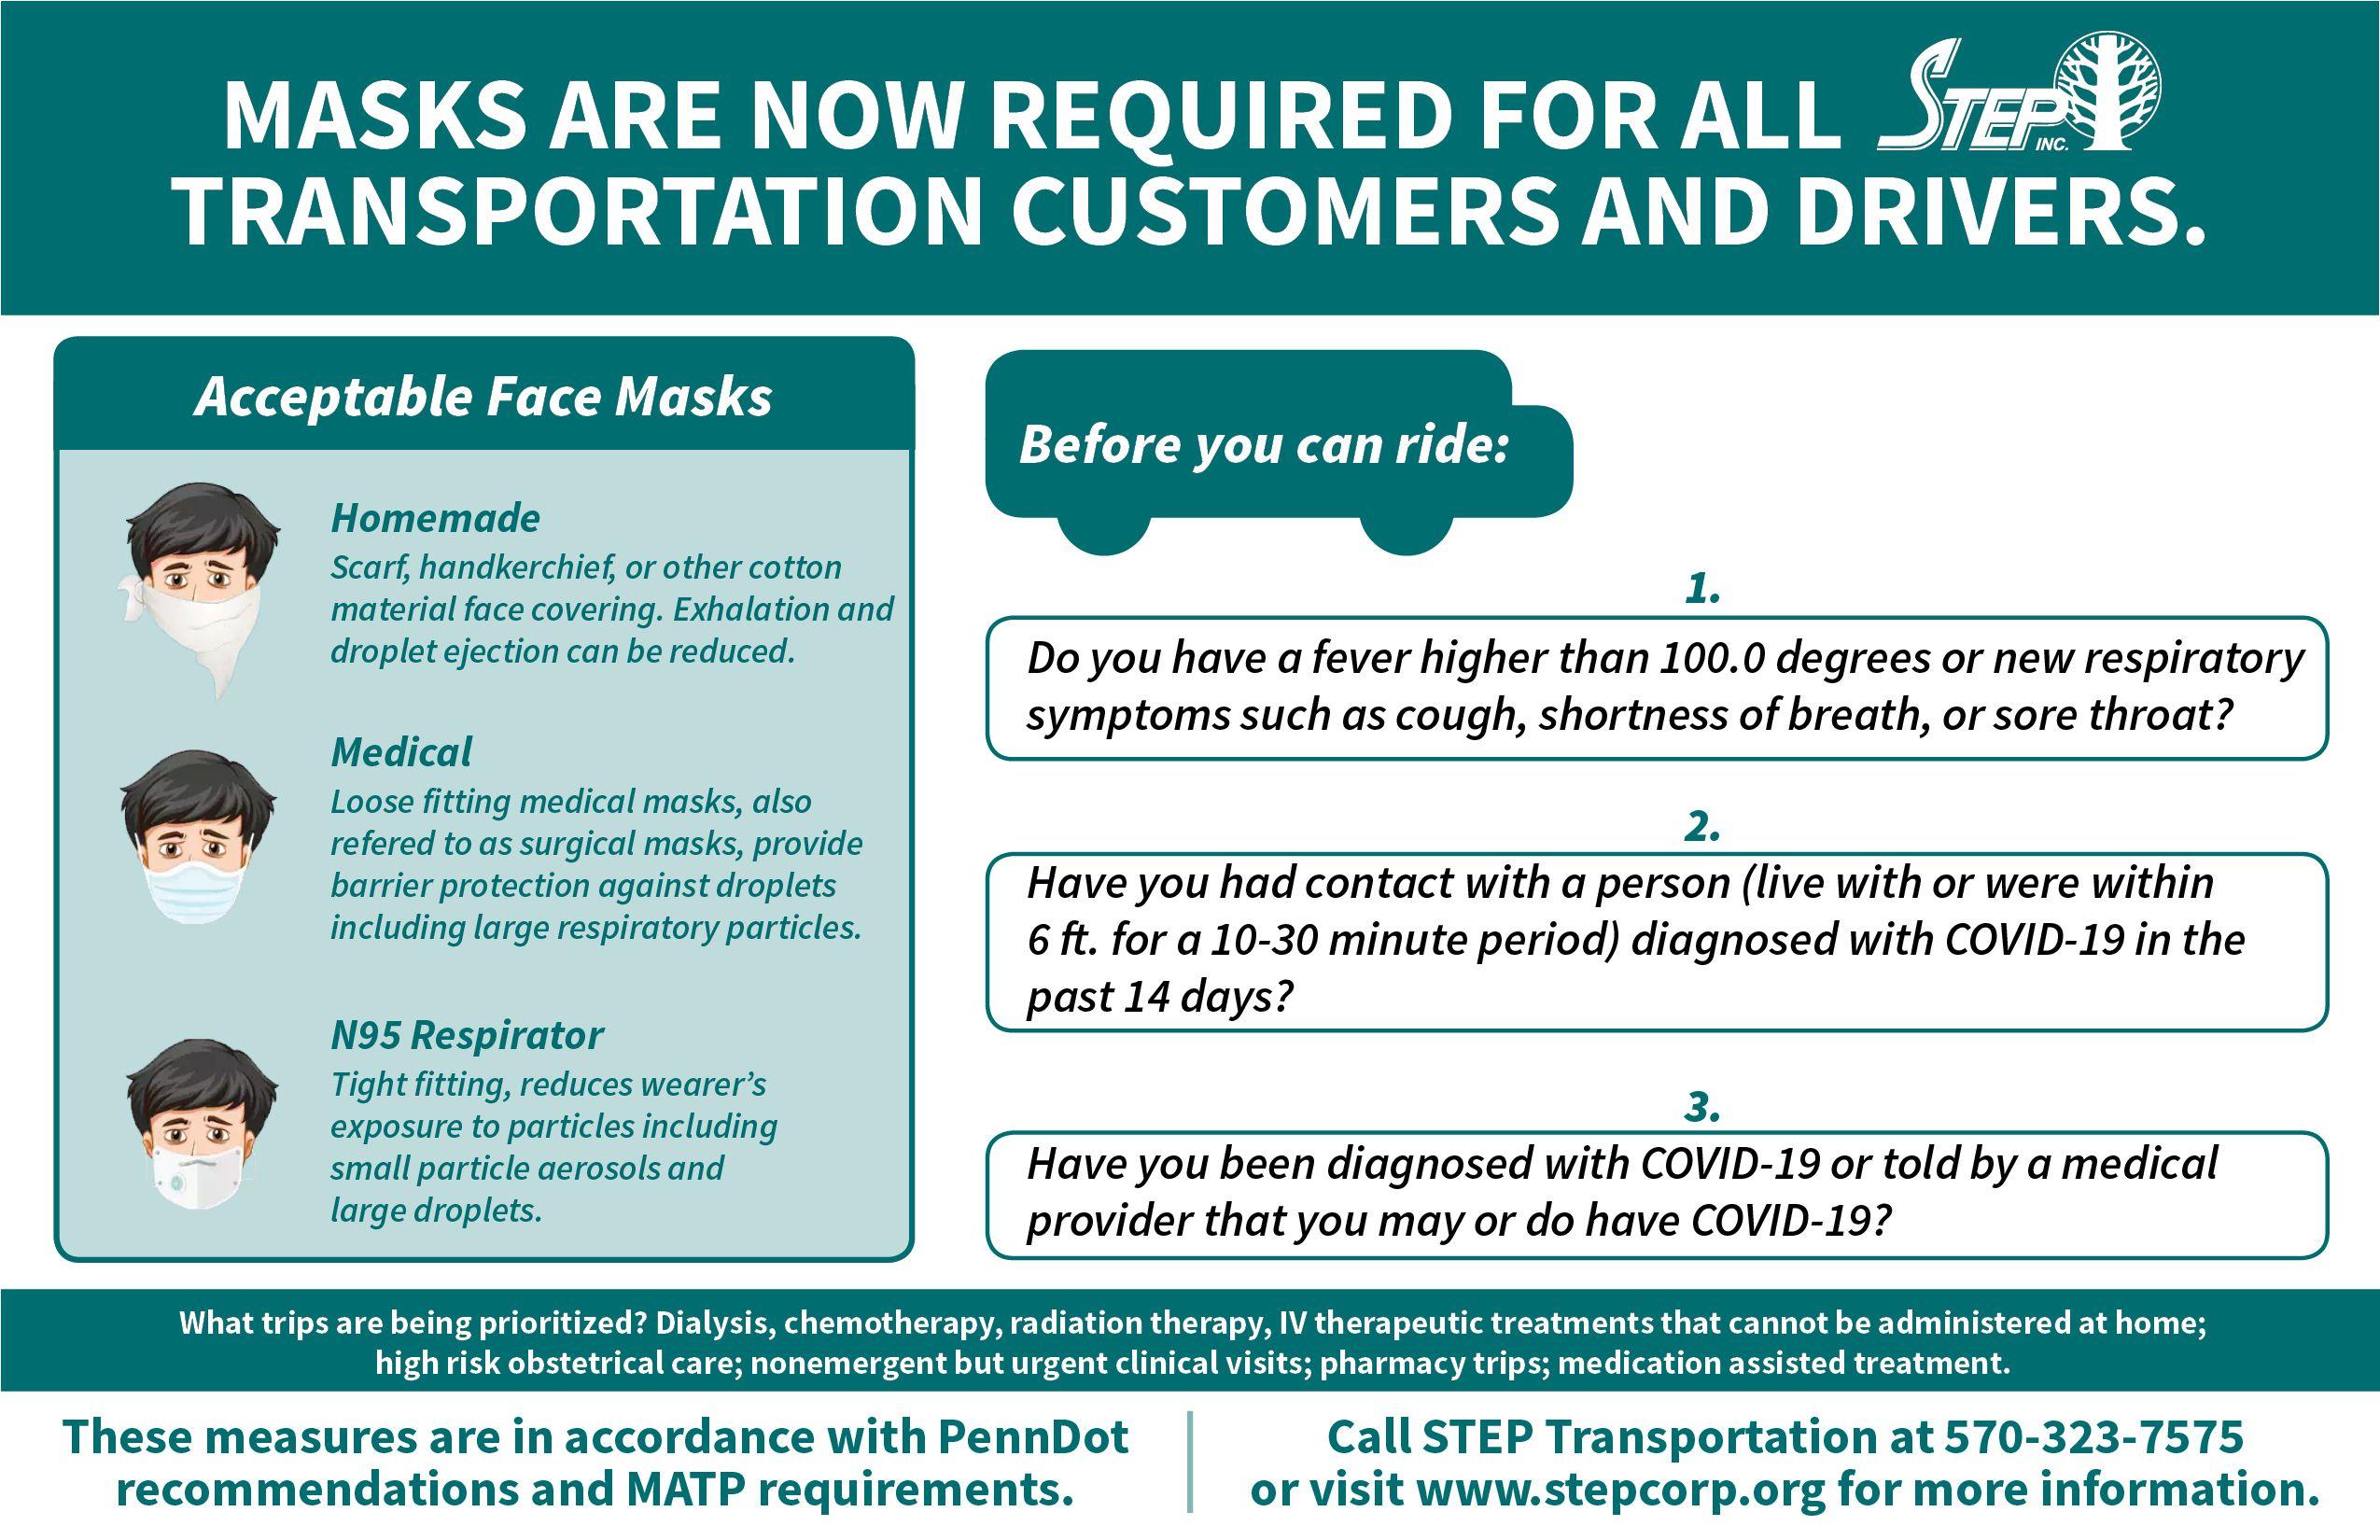 STEP Transportation Following PennDOT, MATP Guidance for Riders